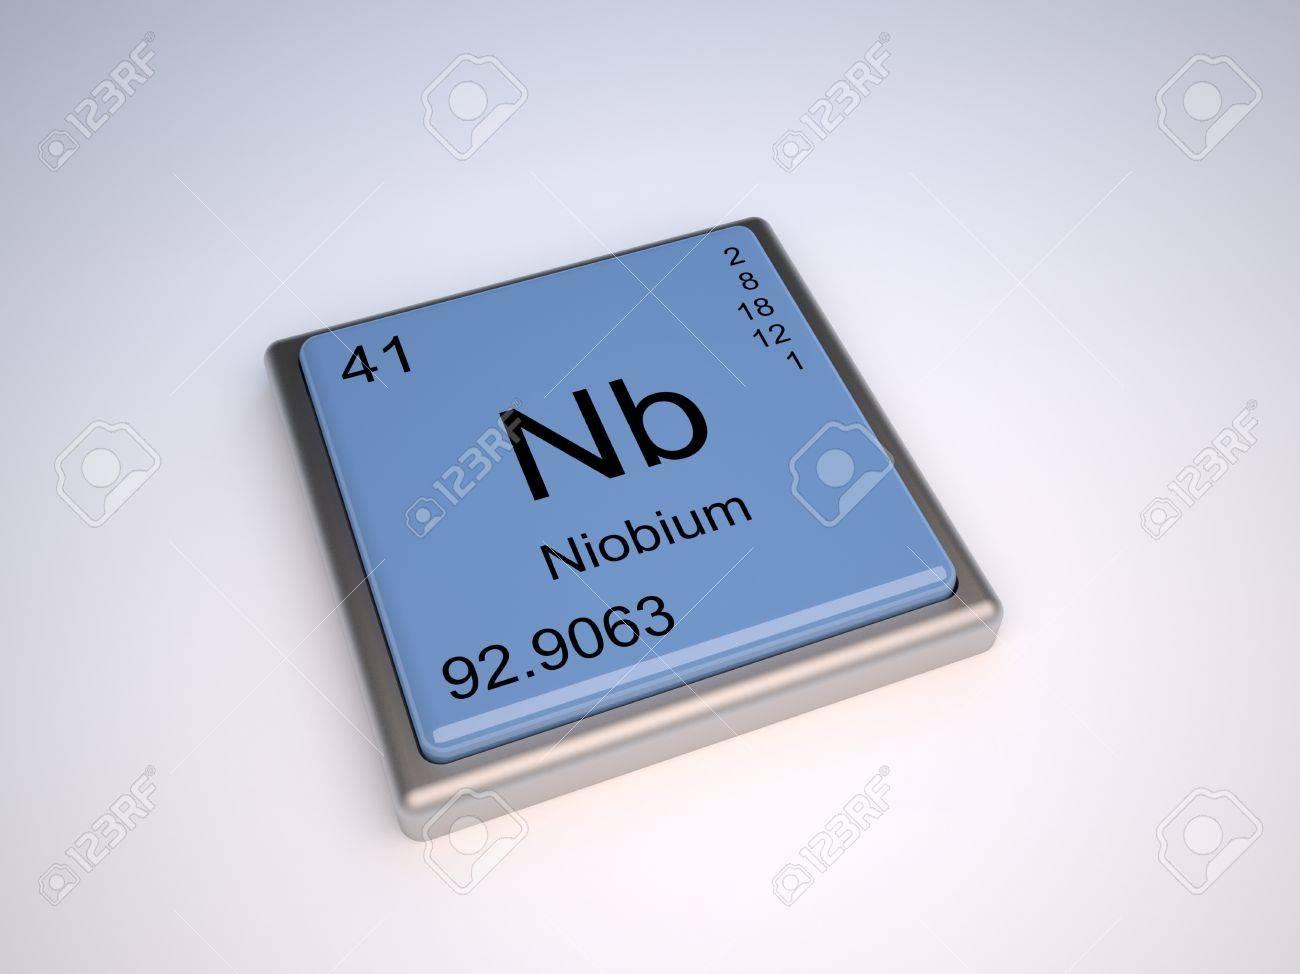 Niobium chemical element of the periodic table with symbol nb niobium chemical element of the periodic table with symbol nb stock photo 9257095 biocorpaavc